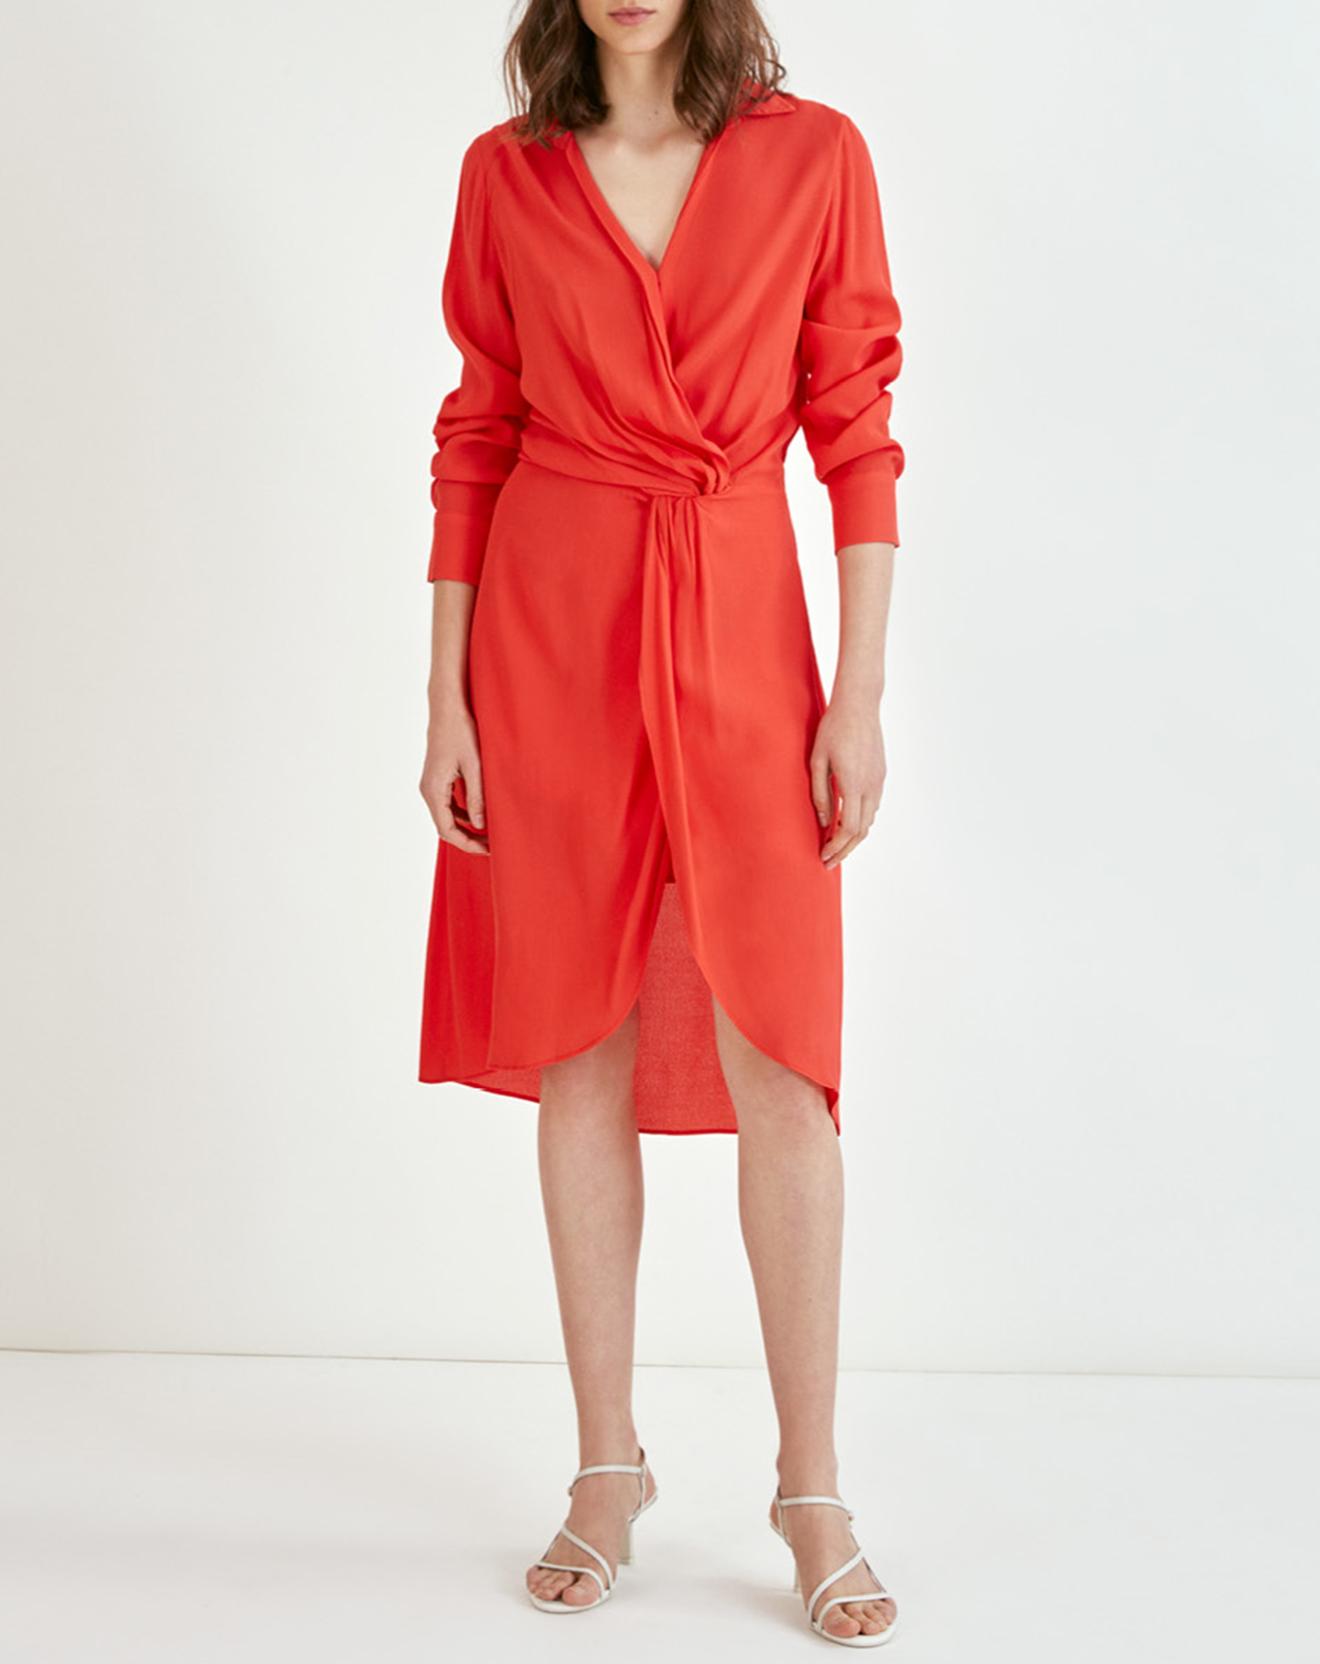 Robe Carita geranium - Suncoo - Modalova